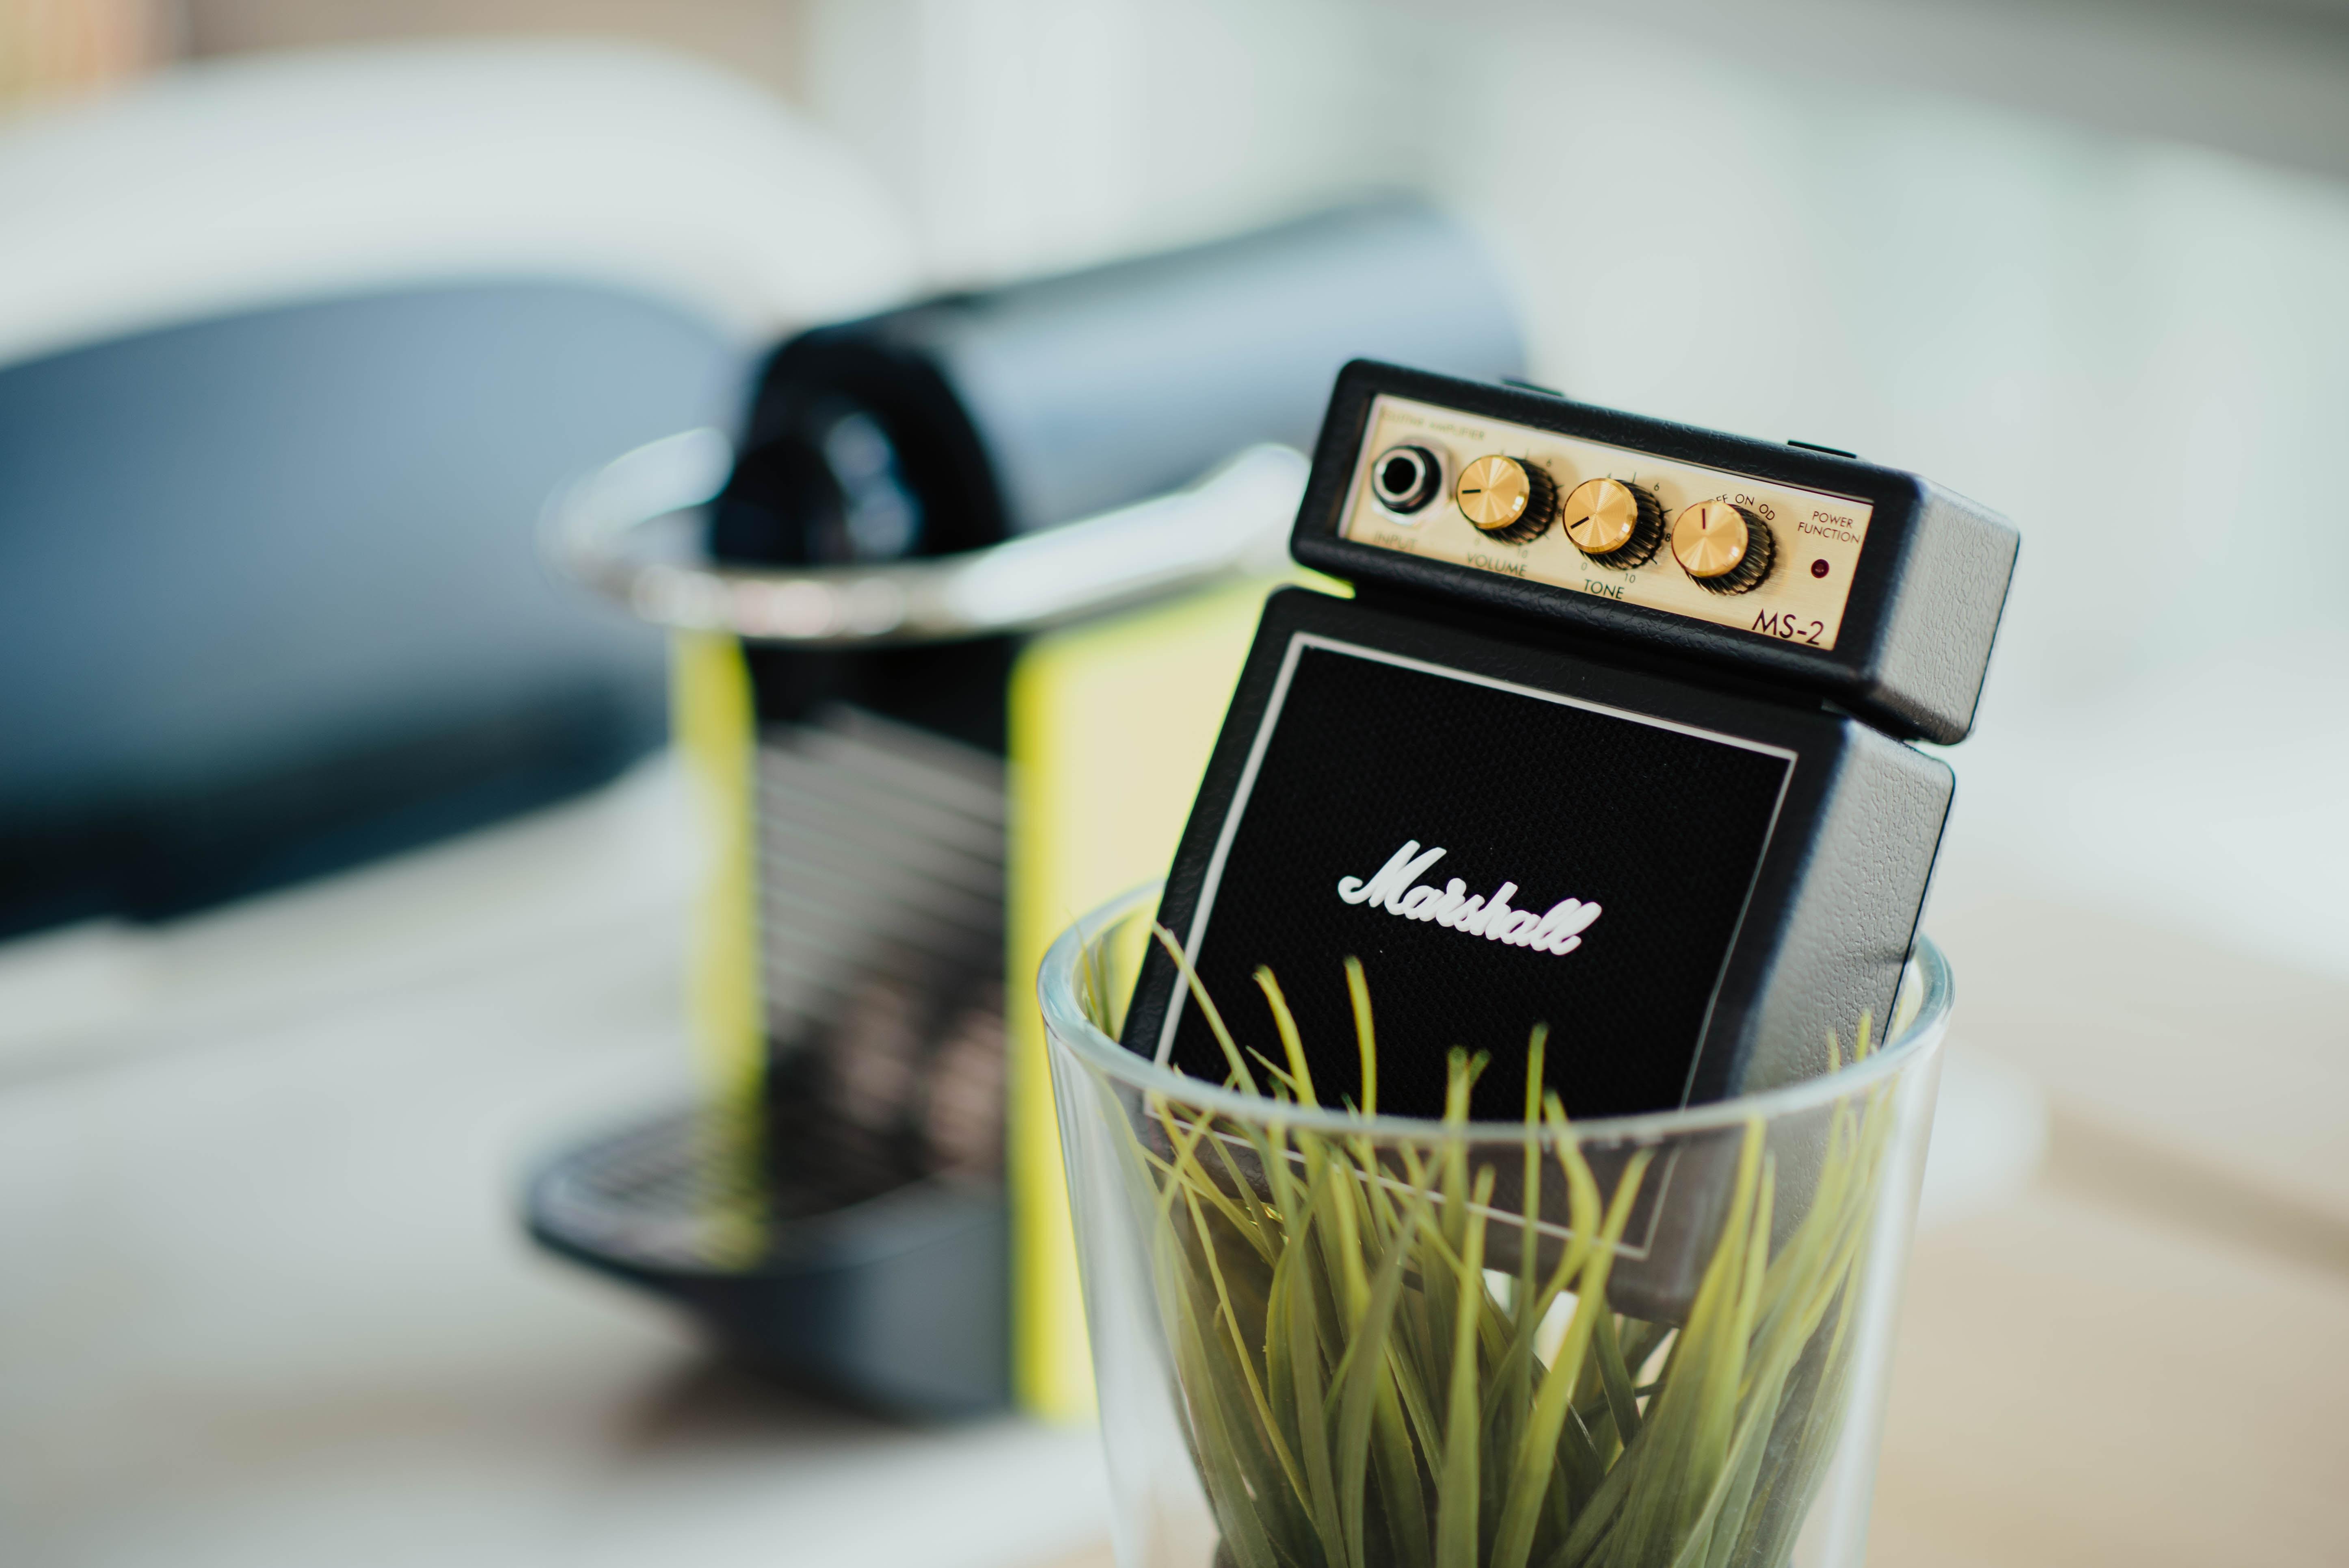 Marshall amplifier in vase